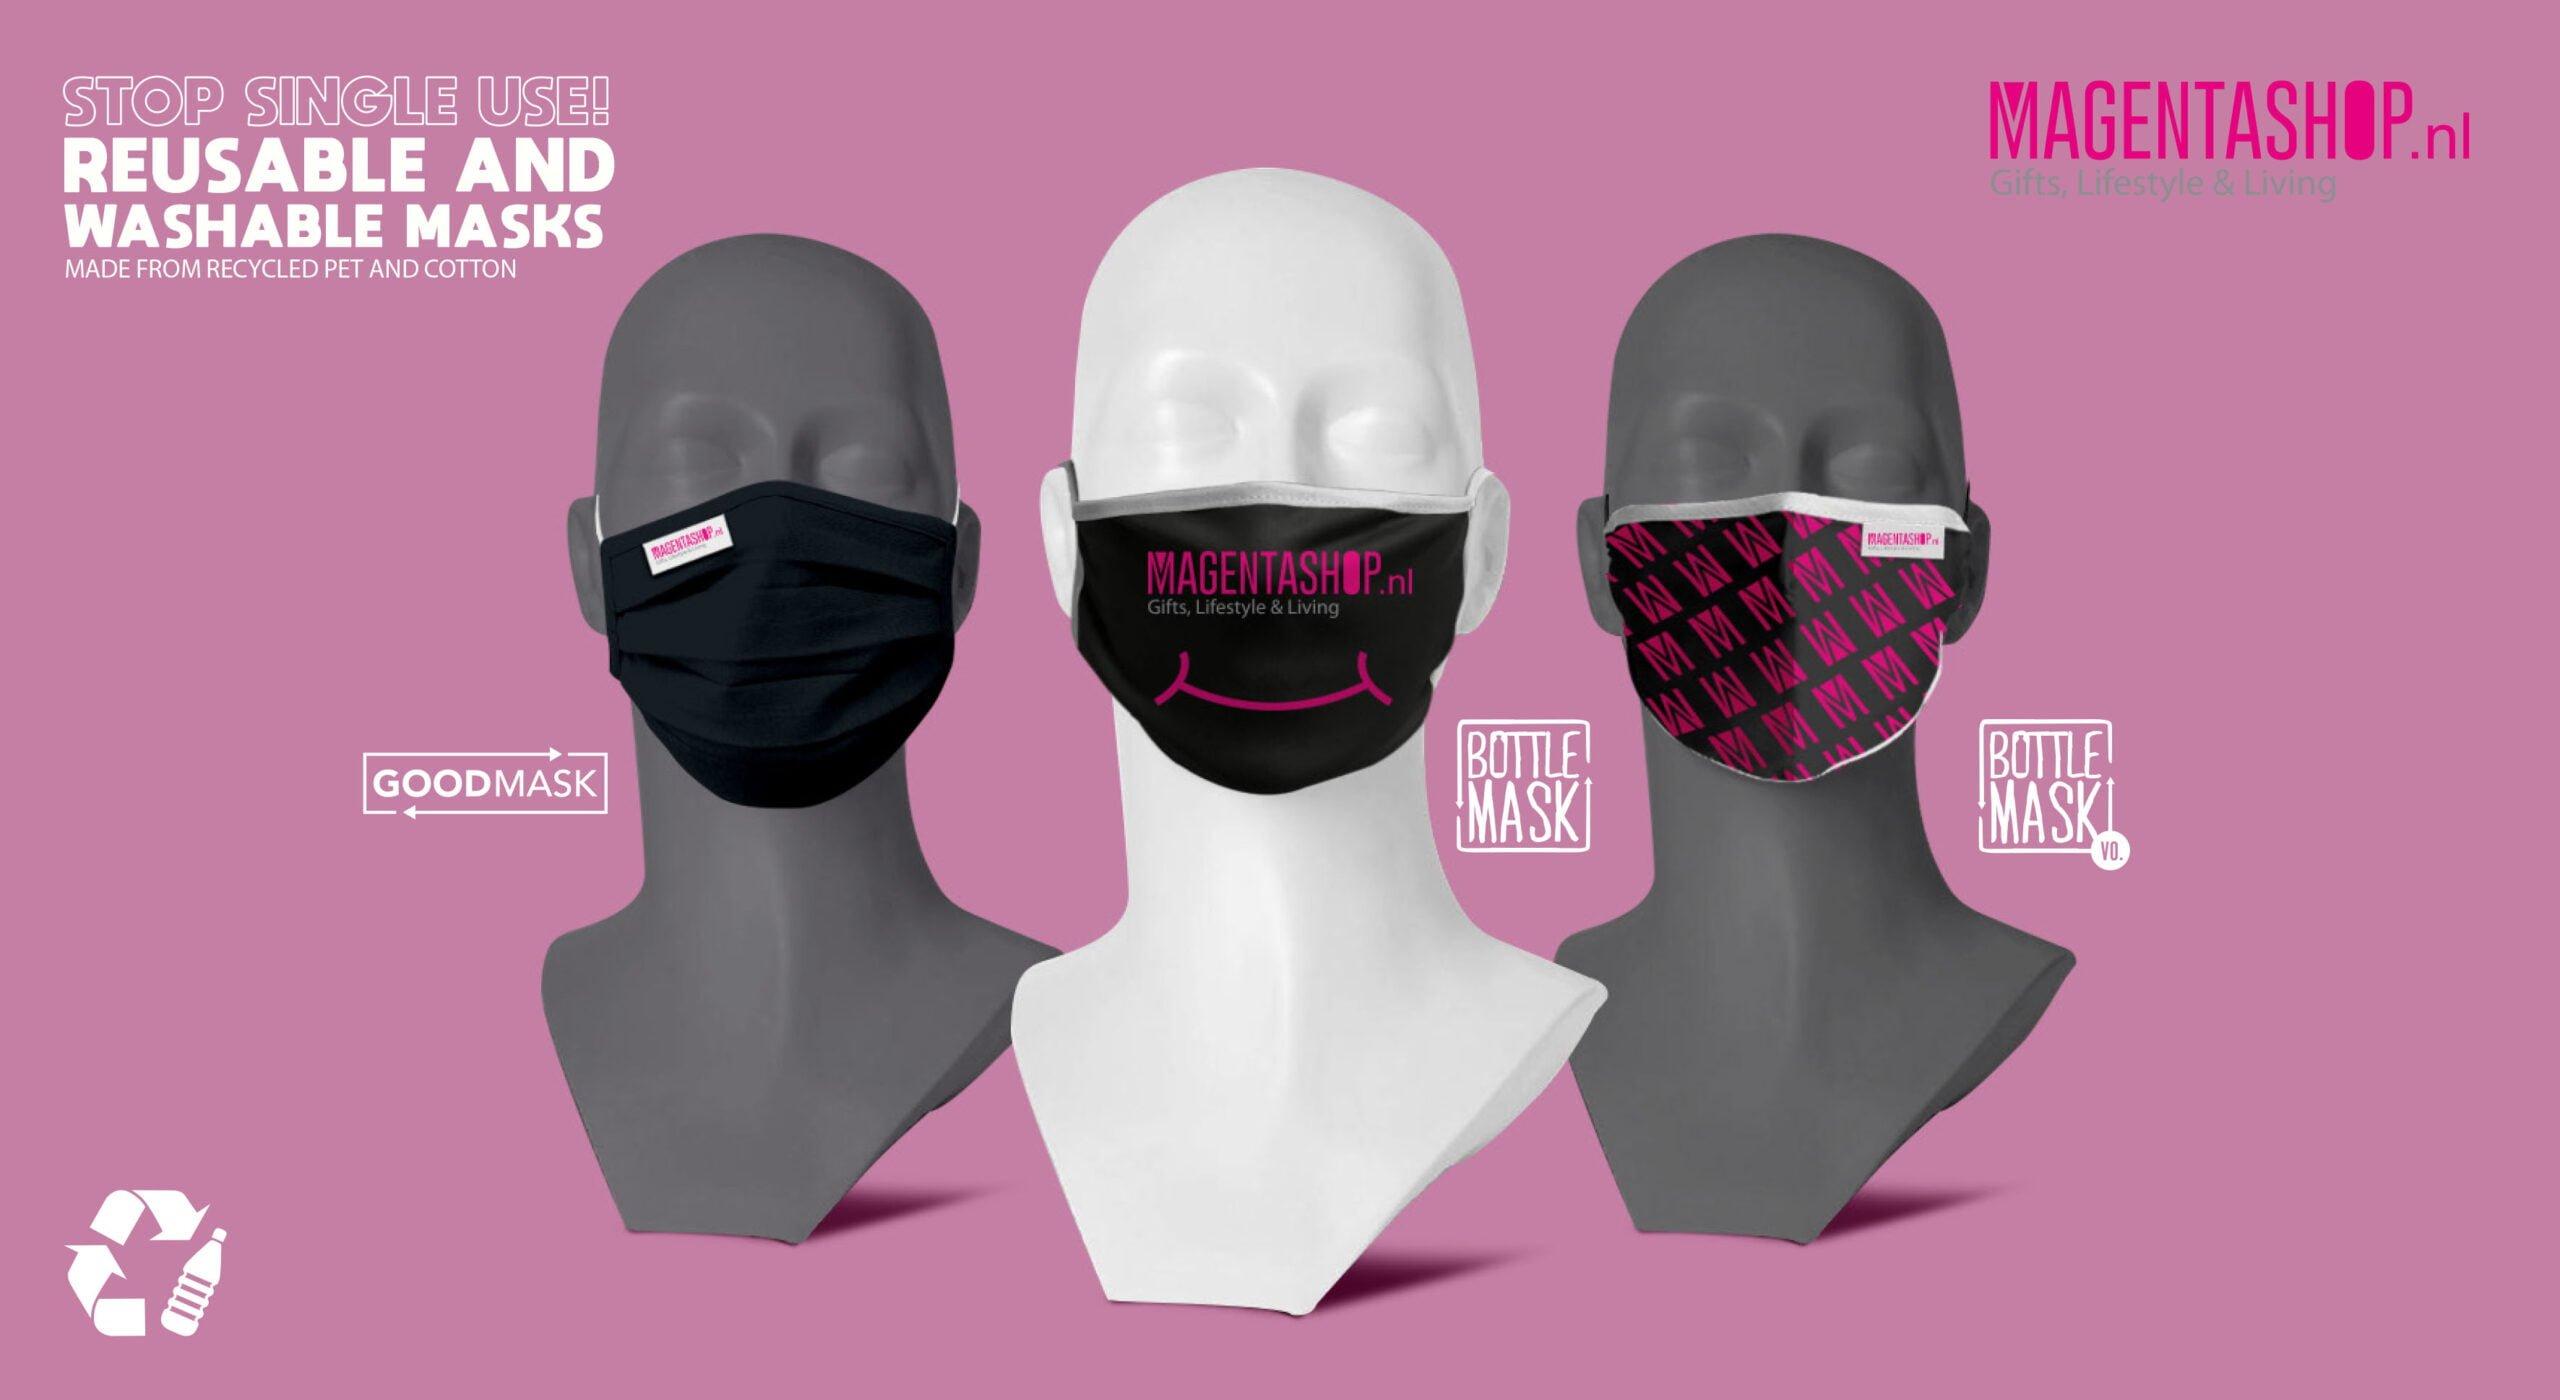 Mondmaskers Magentashop